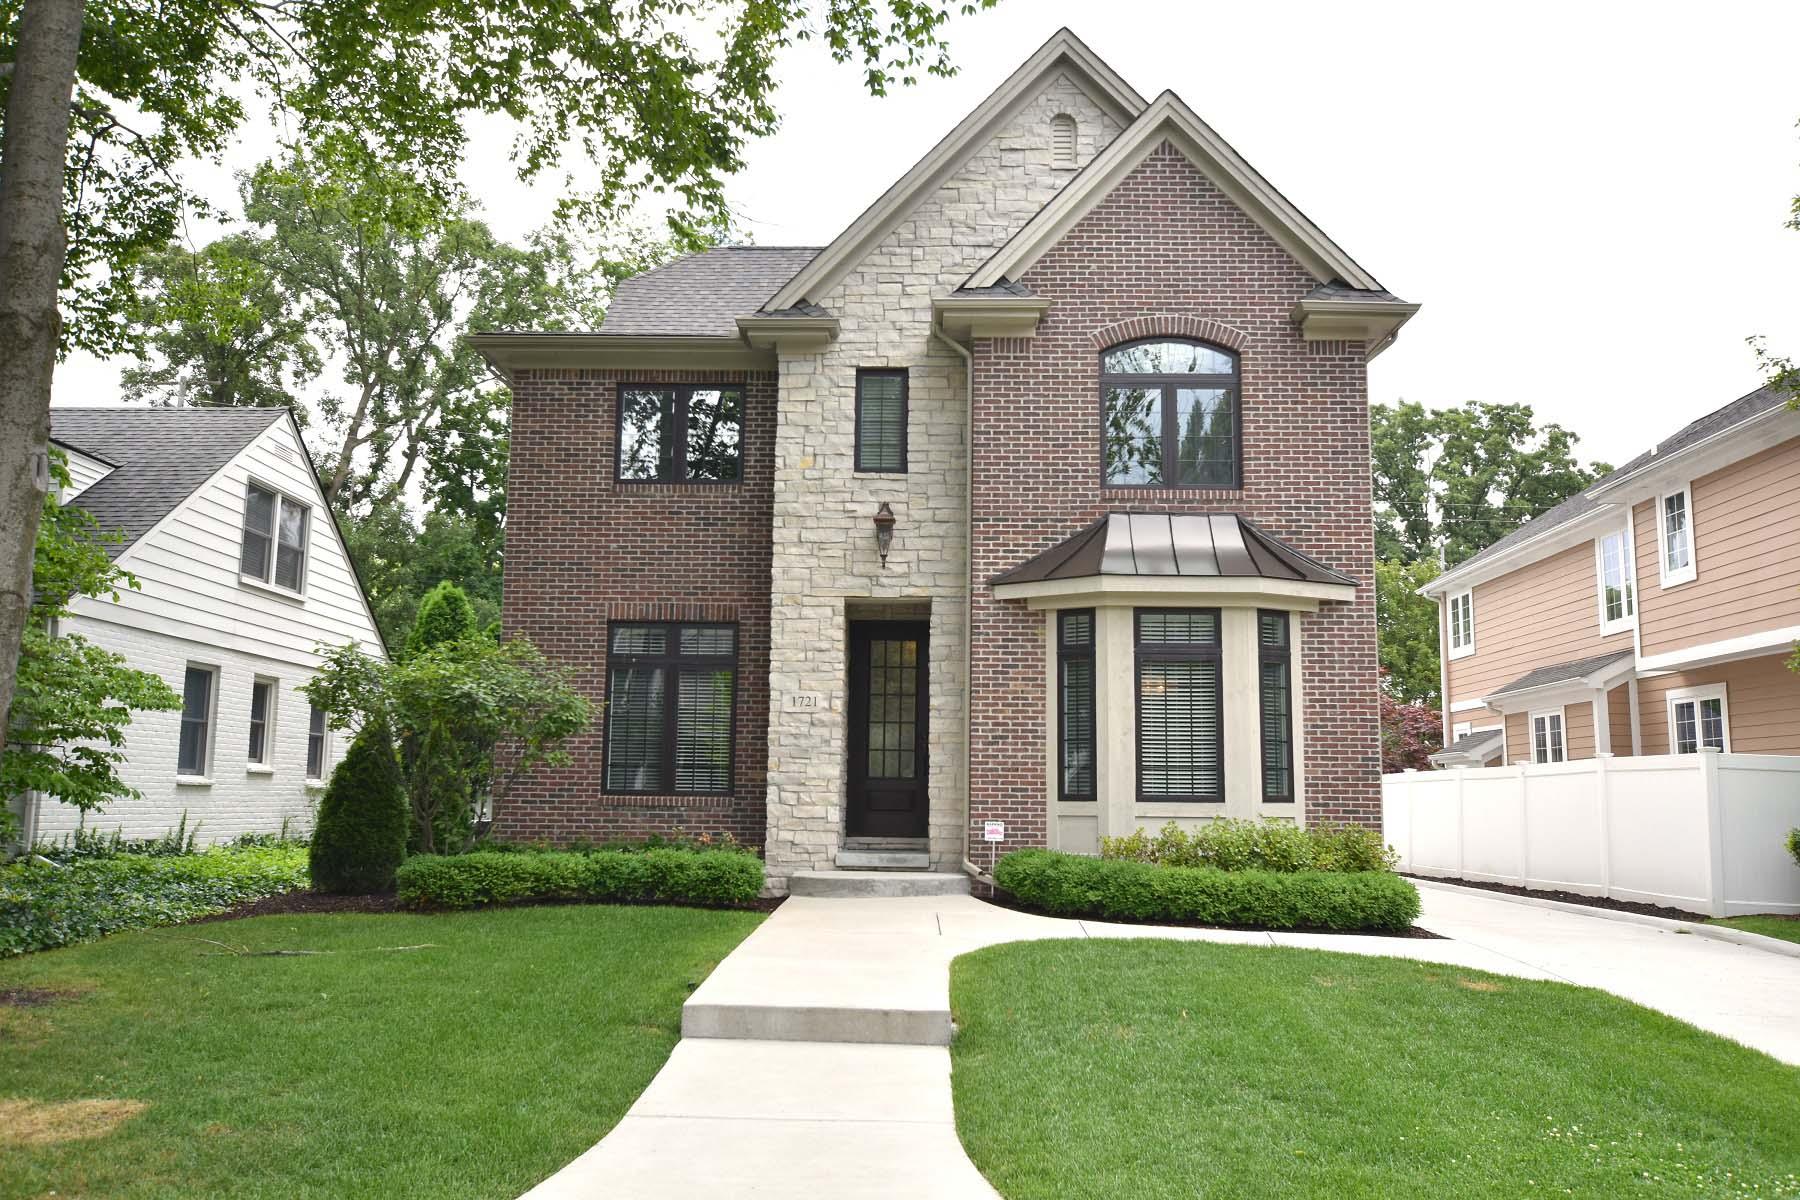 Single Family Homes for Sale at Birmingham 1721 Stanley Blvd Birmingham, Michigan 48009 United States